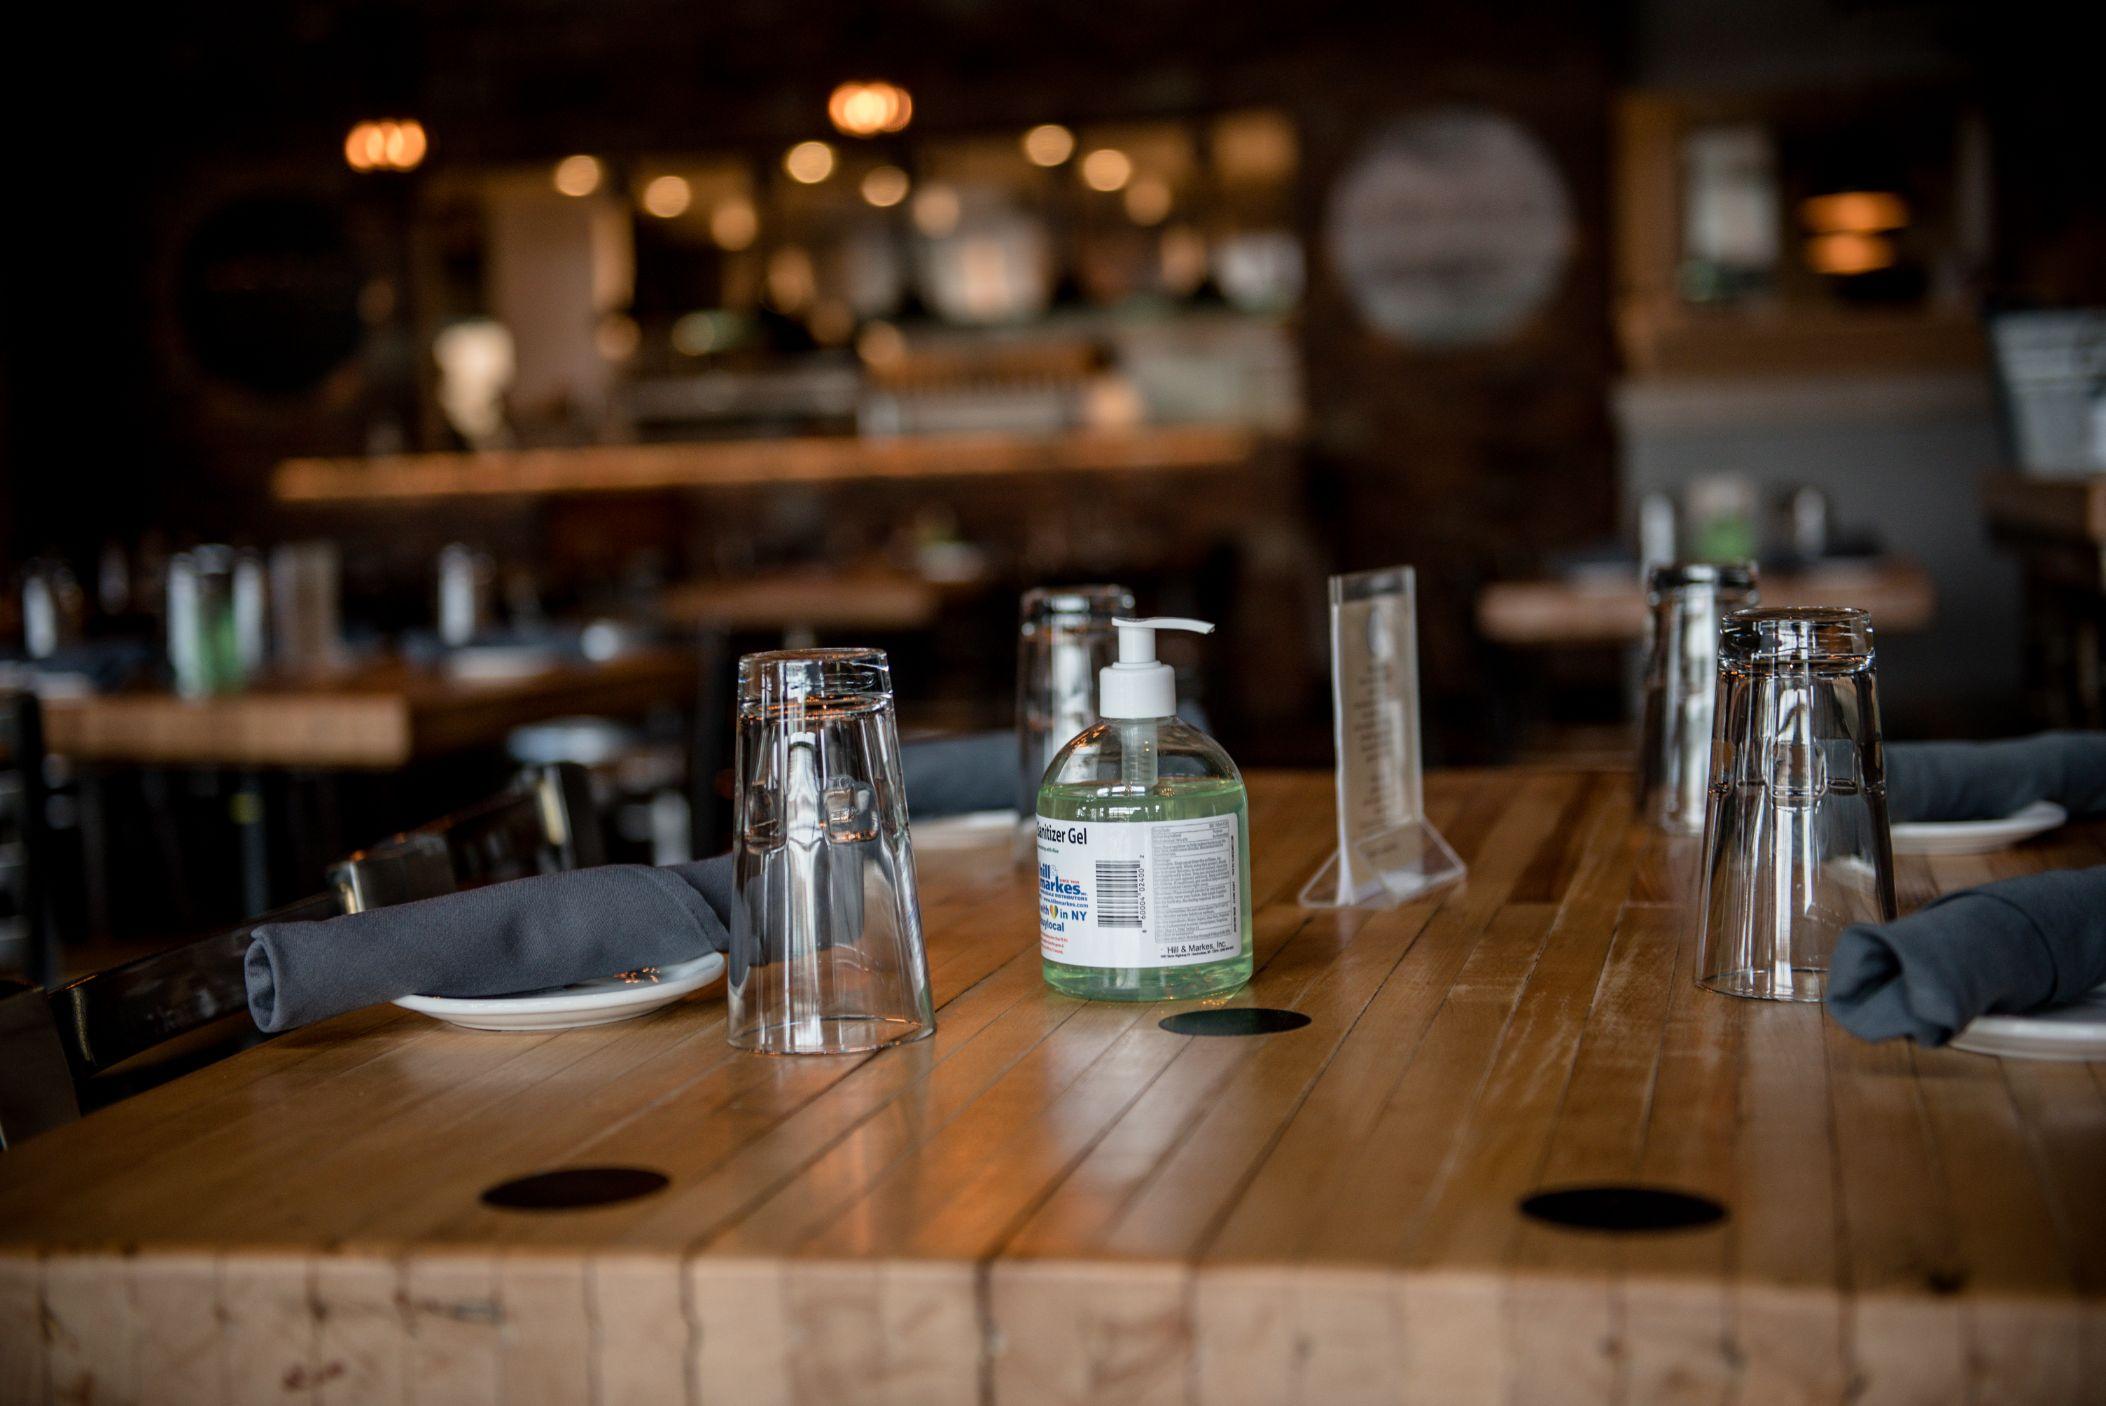 Innovo Kitchen Safety Measures Sanitizer 3 1